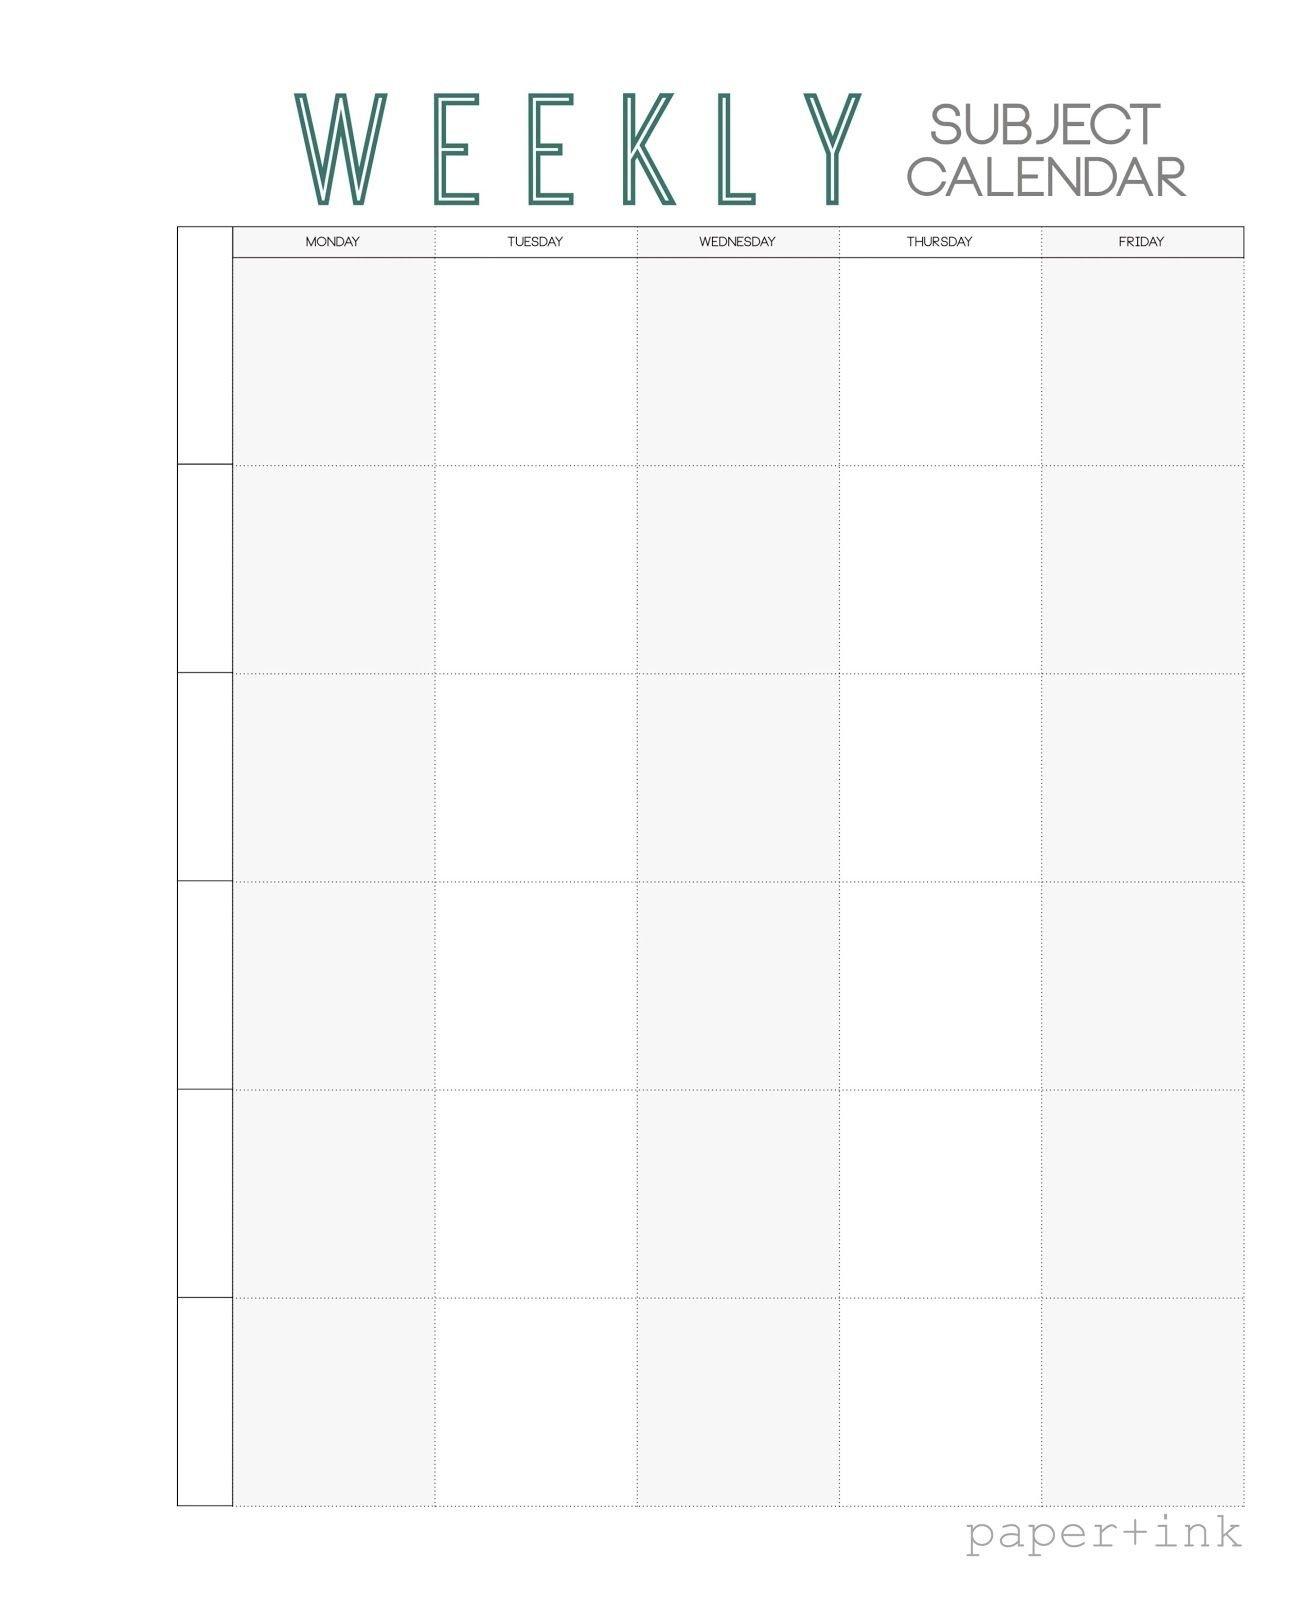 Free Weekly Subject Calendar | School Calendar, Weekly School Calendar Monday Thru Friday